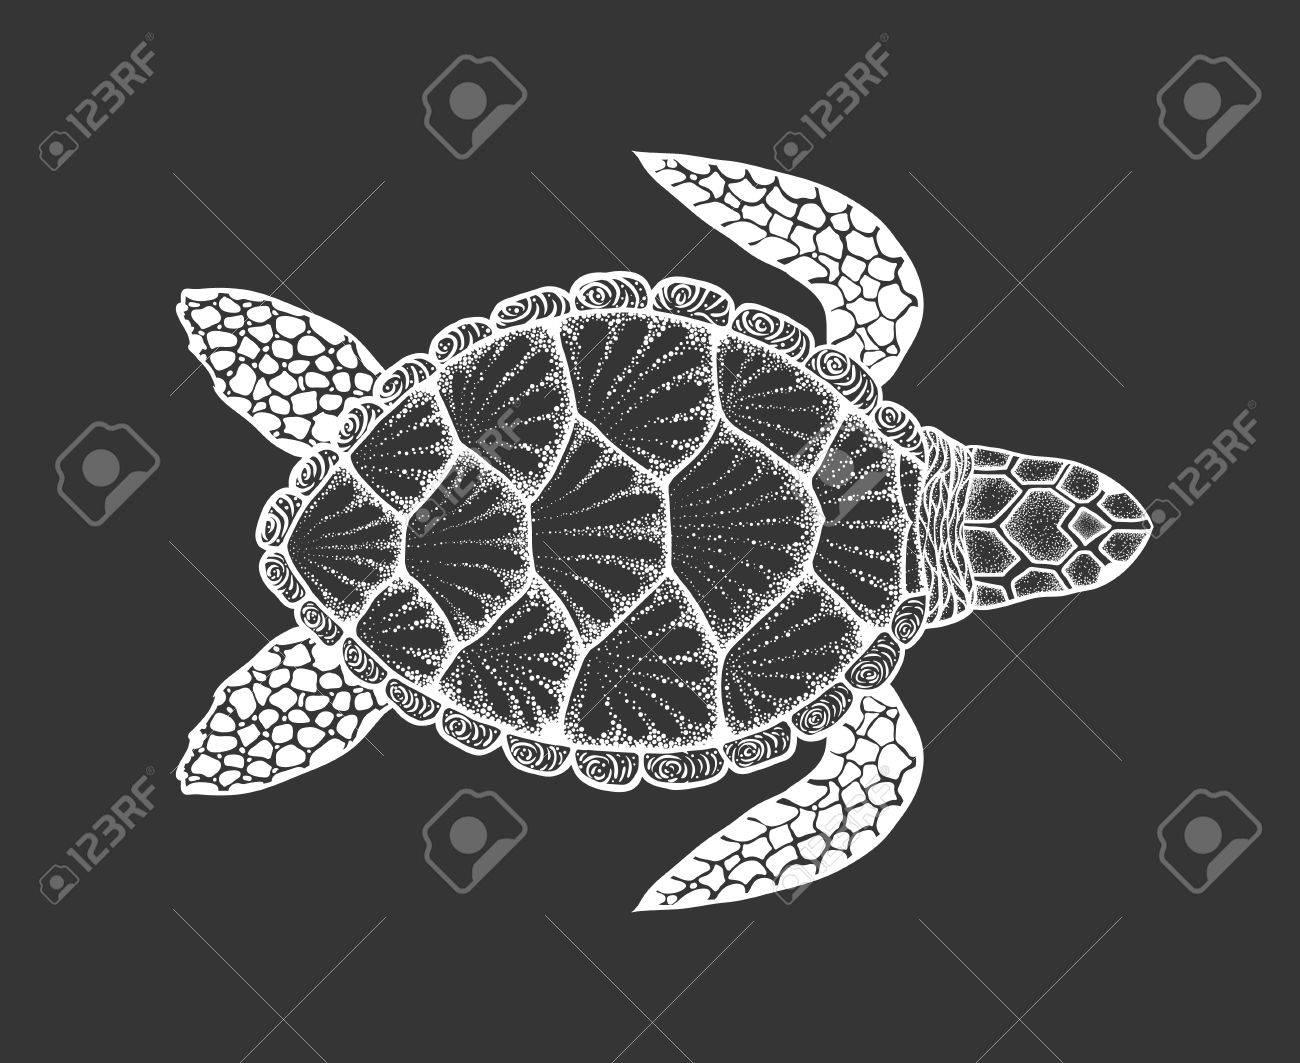 Line Art Illustration Style : Sea turtle in line art style. hand drawn vector illustration